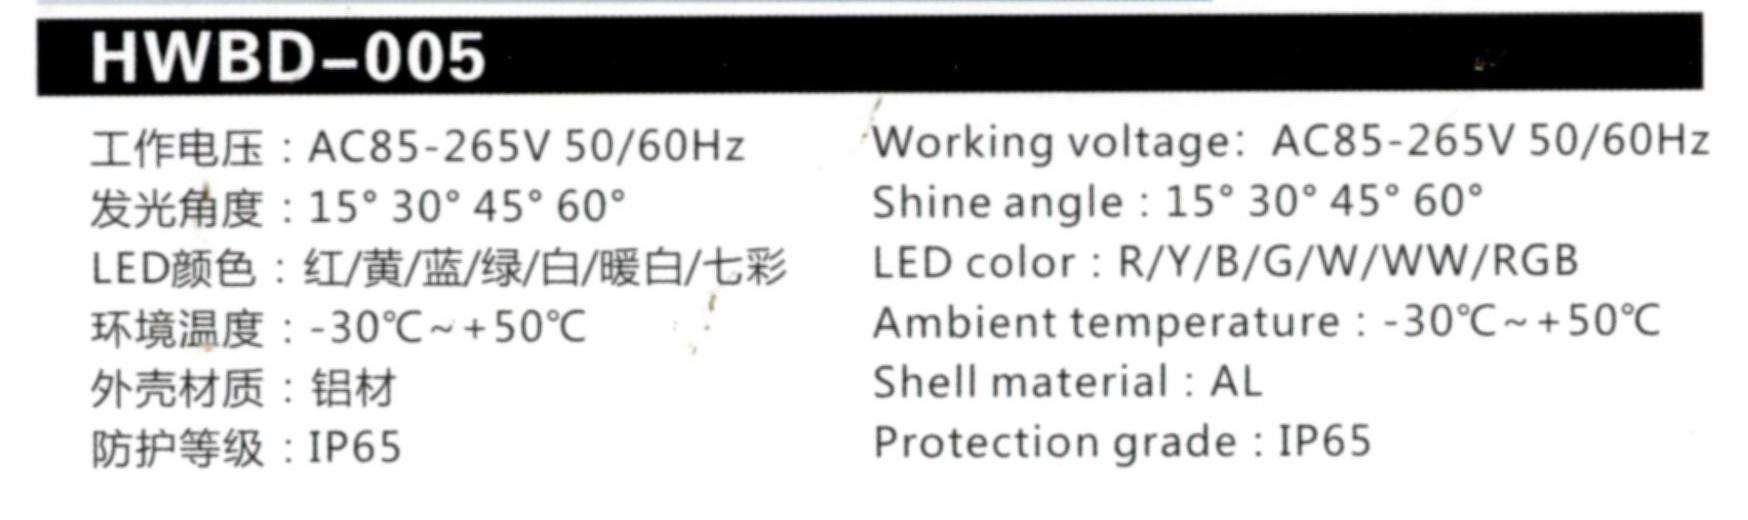 LED户外壁灯Model∶HWBD-005参数.jpg